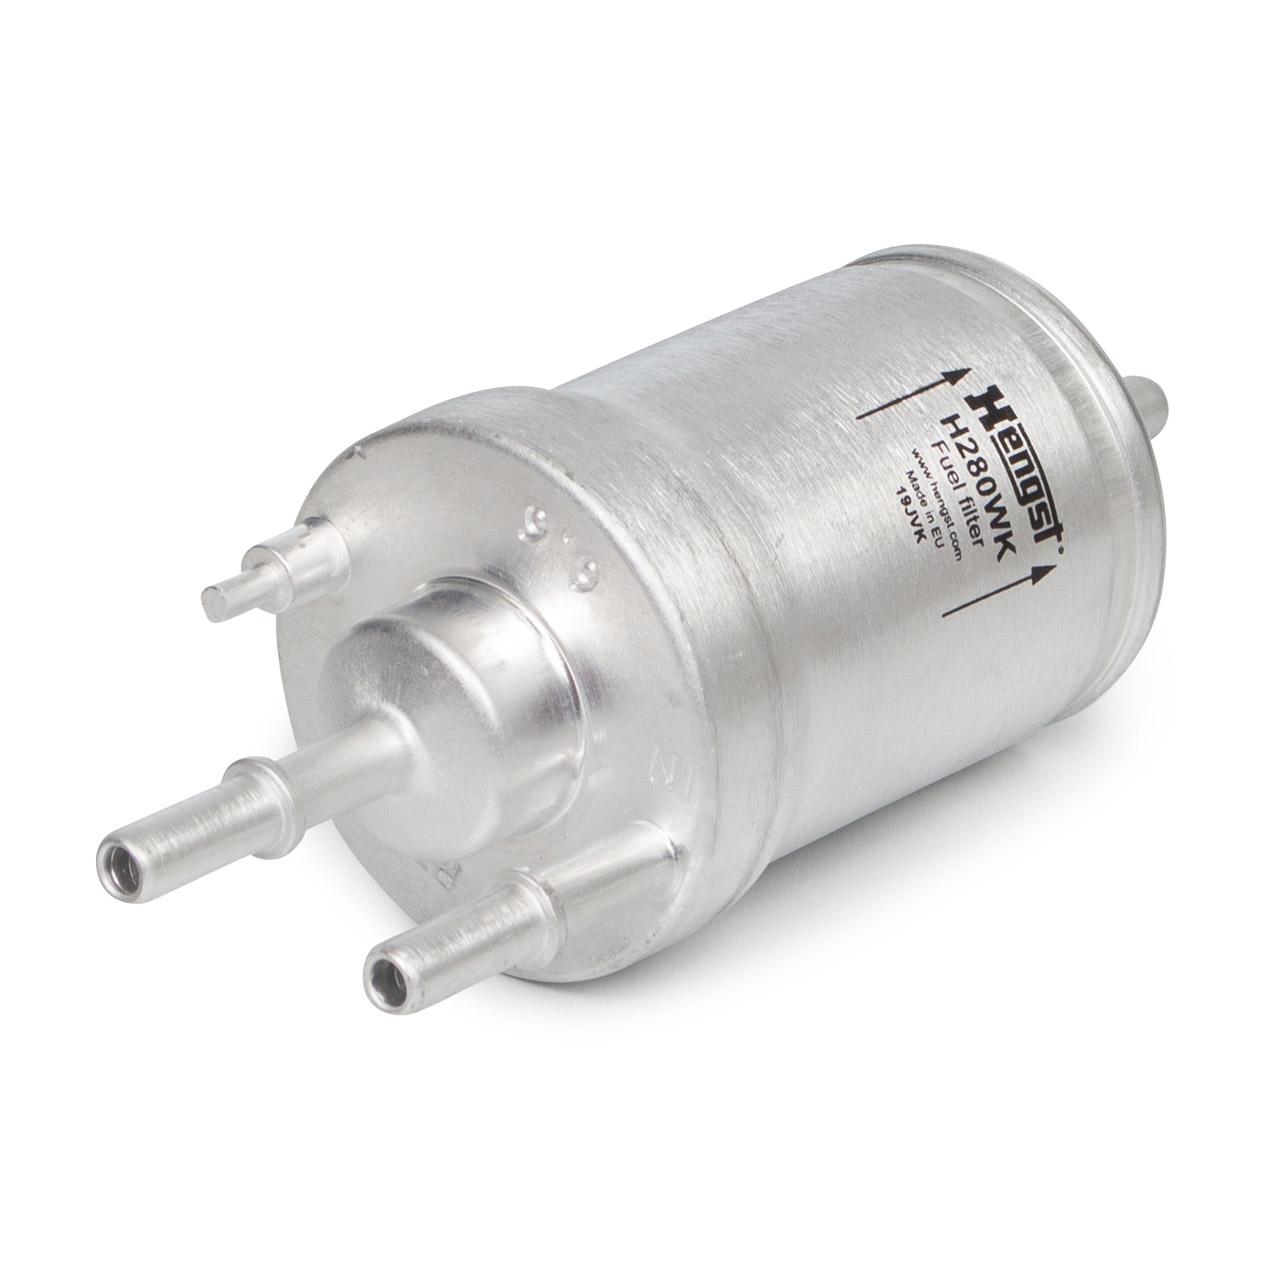 HENGST H280WK Kraftstofffilter für AUDI A1 A3 SEAT SKODA VW GOLF 5 6 1.0-2.0 TSI